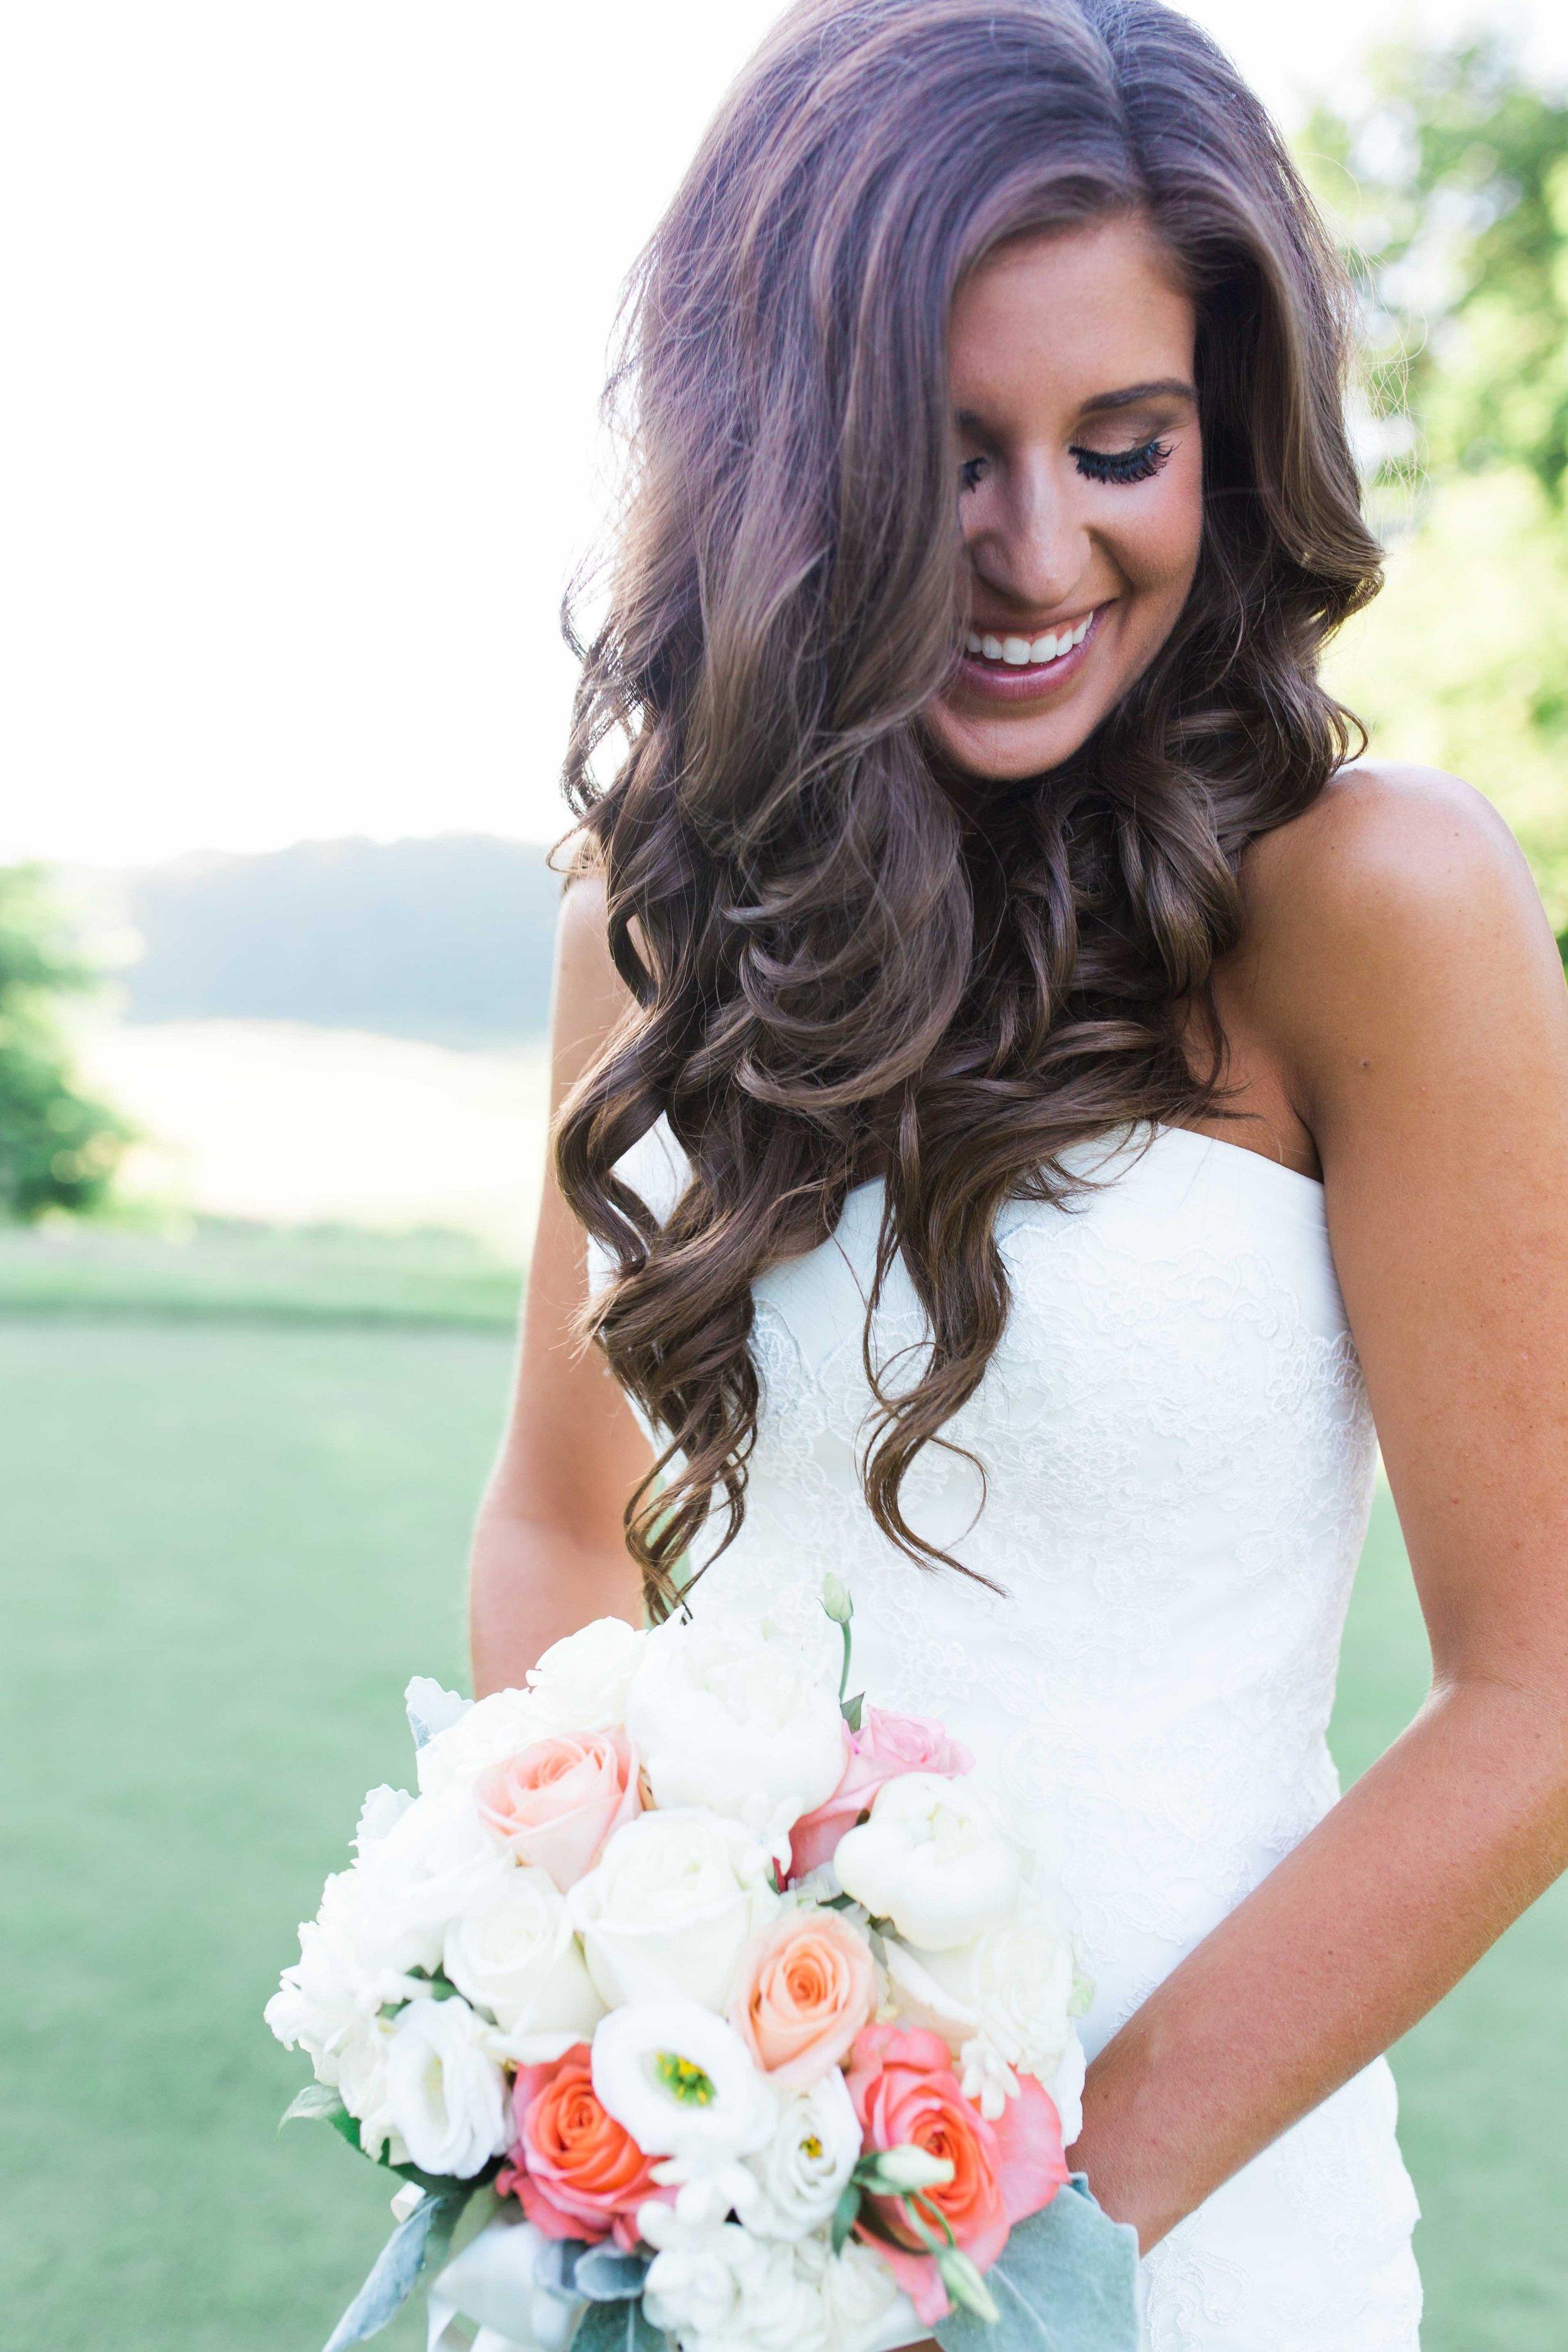 Photo: Lindsey Kay Photography | Make-up: Margie Naatz  Bride: Chrissy P.